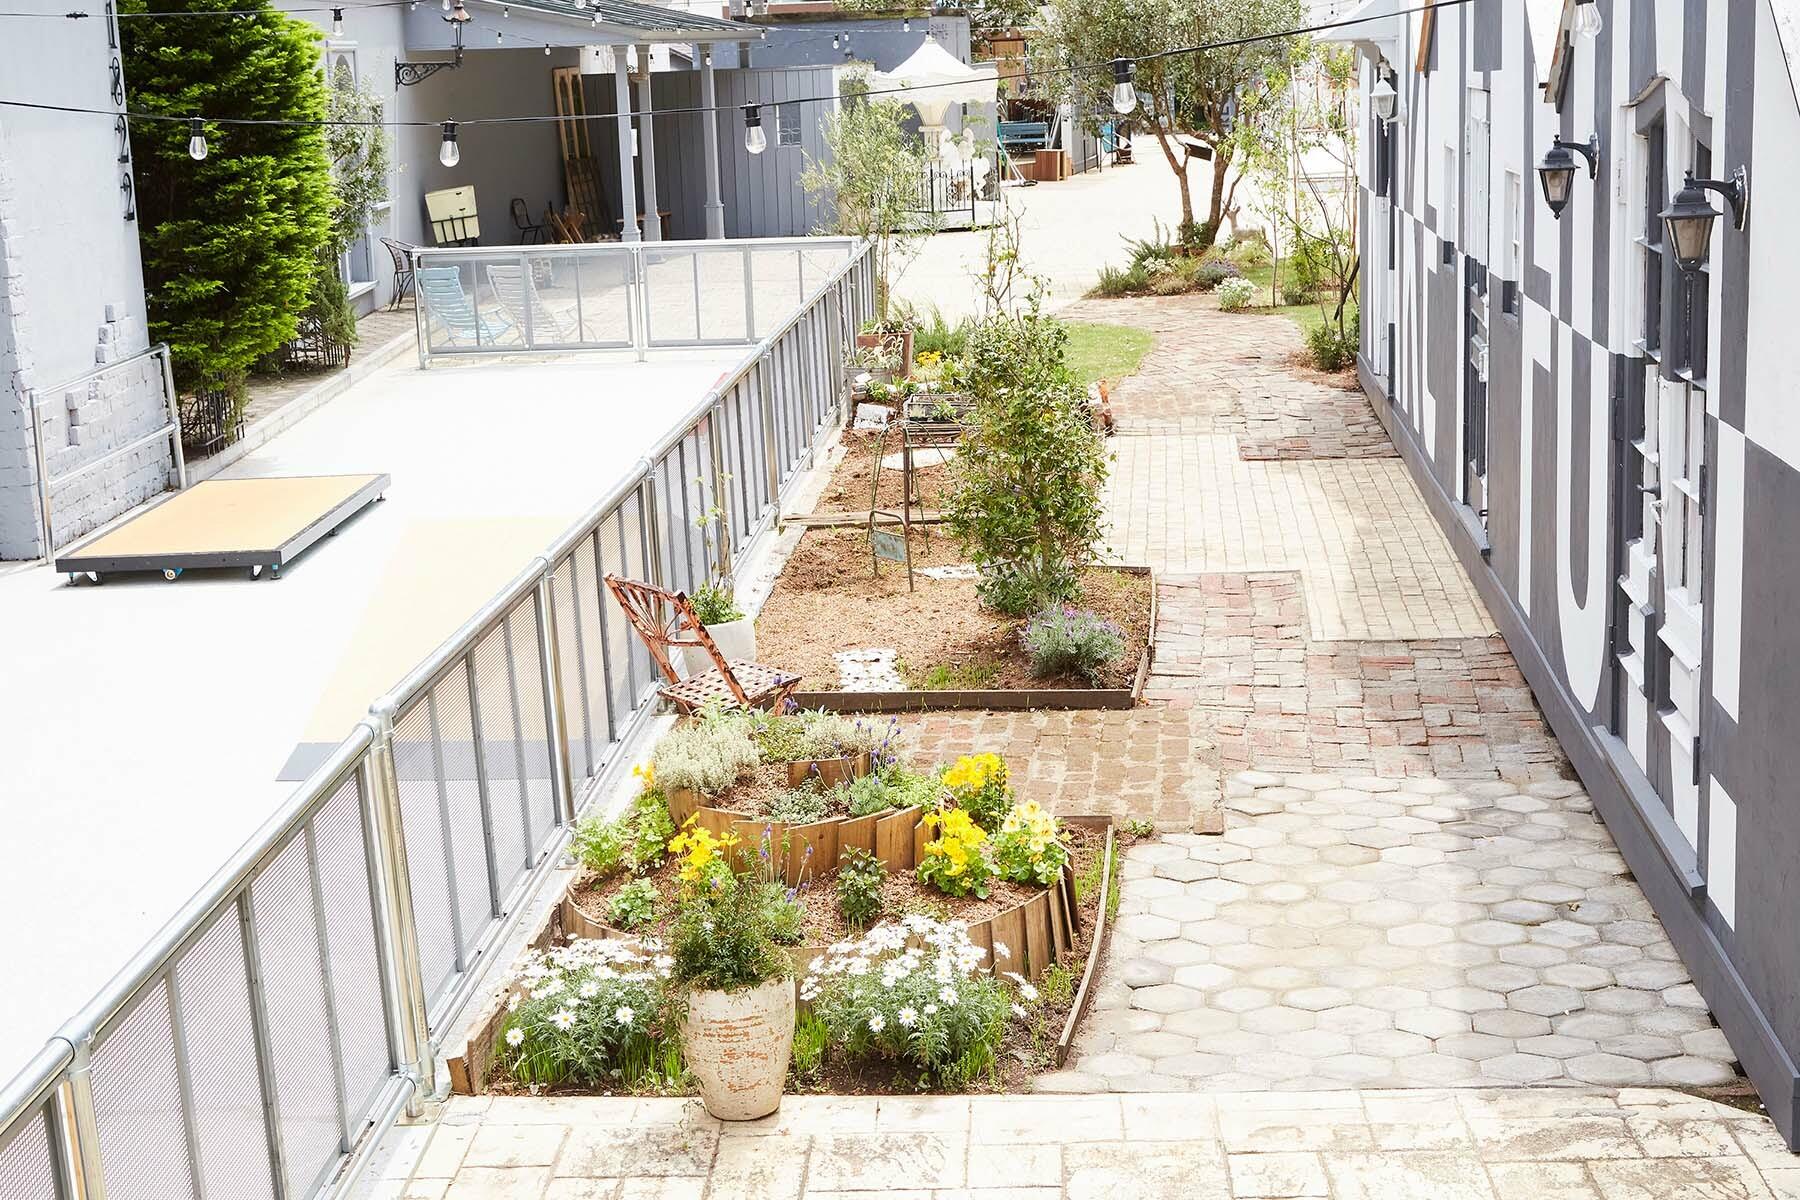 SOUTH SIDE PARK (サウスサイドパーク)